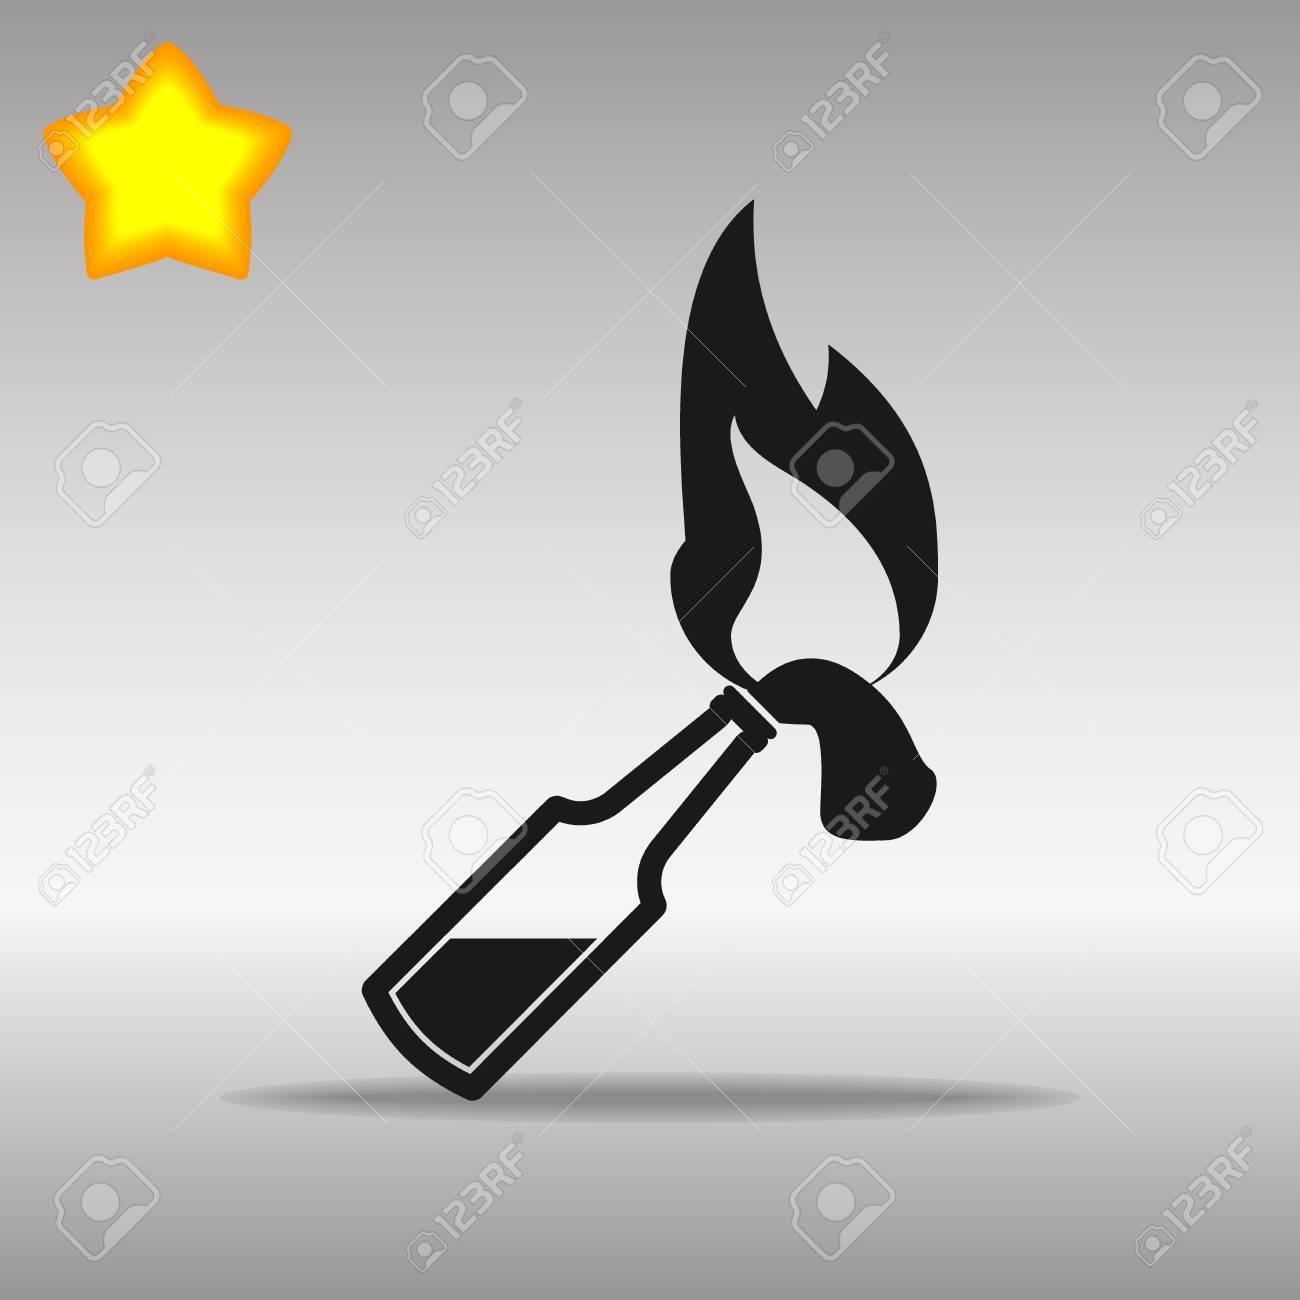 Molotov black Icon button logo symbol concept high quality on the gray background - 82176419